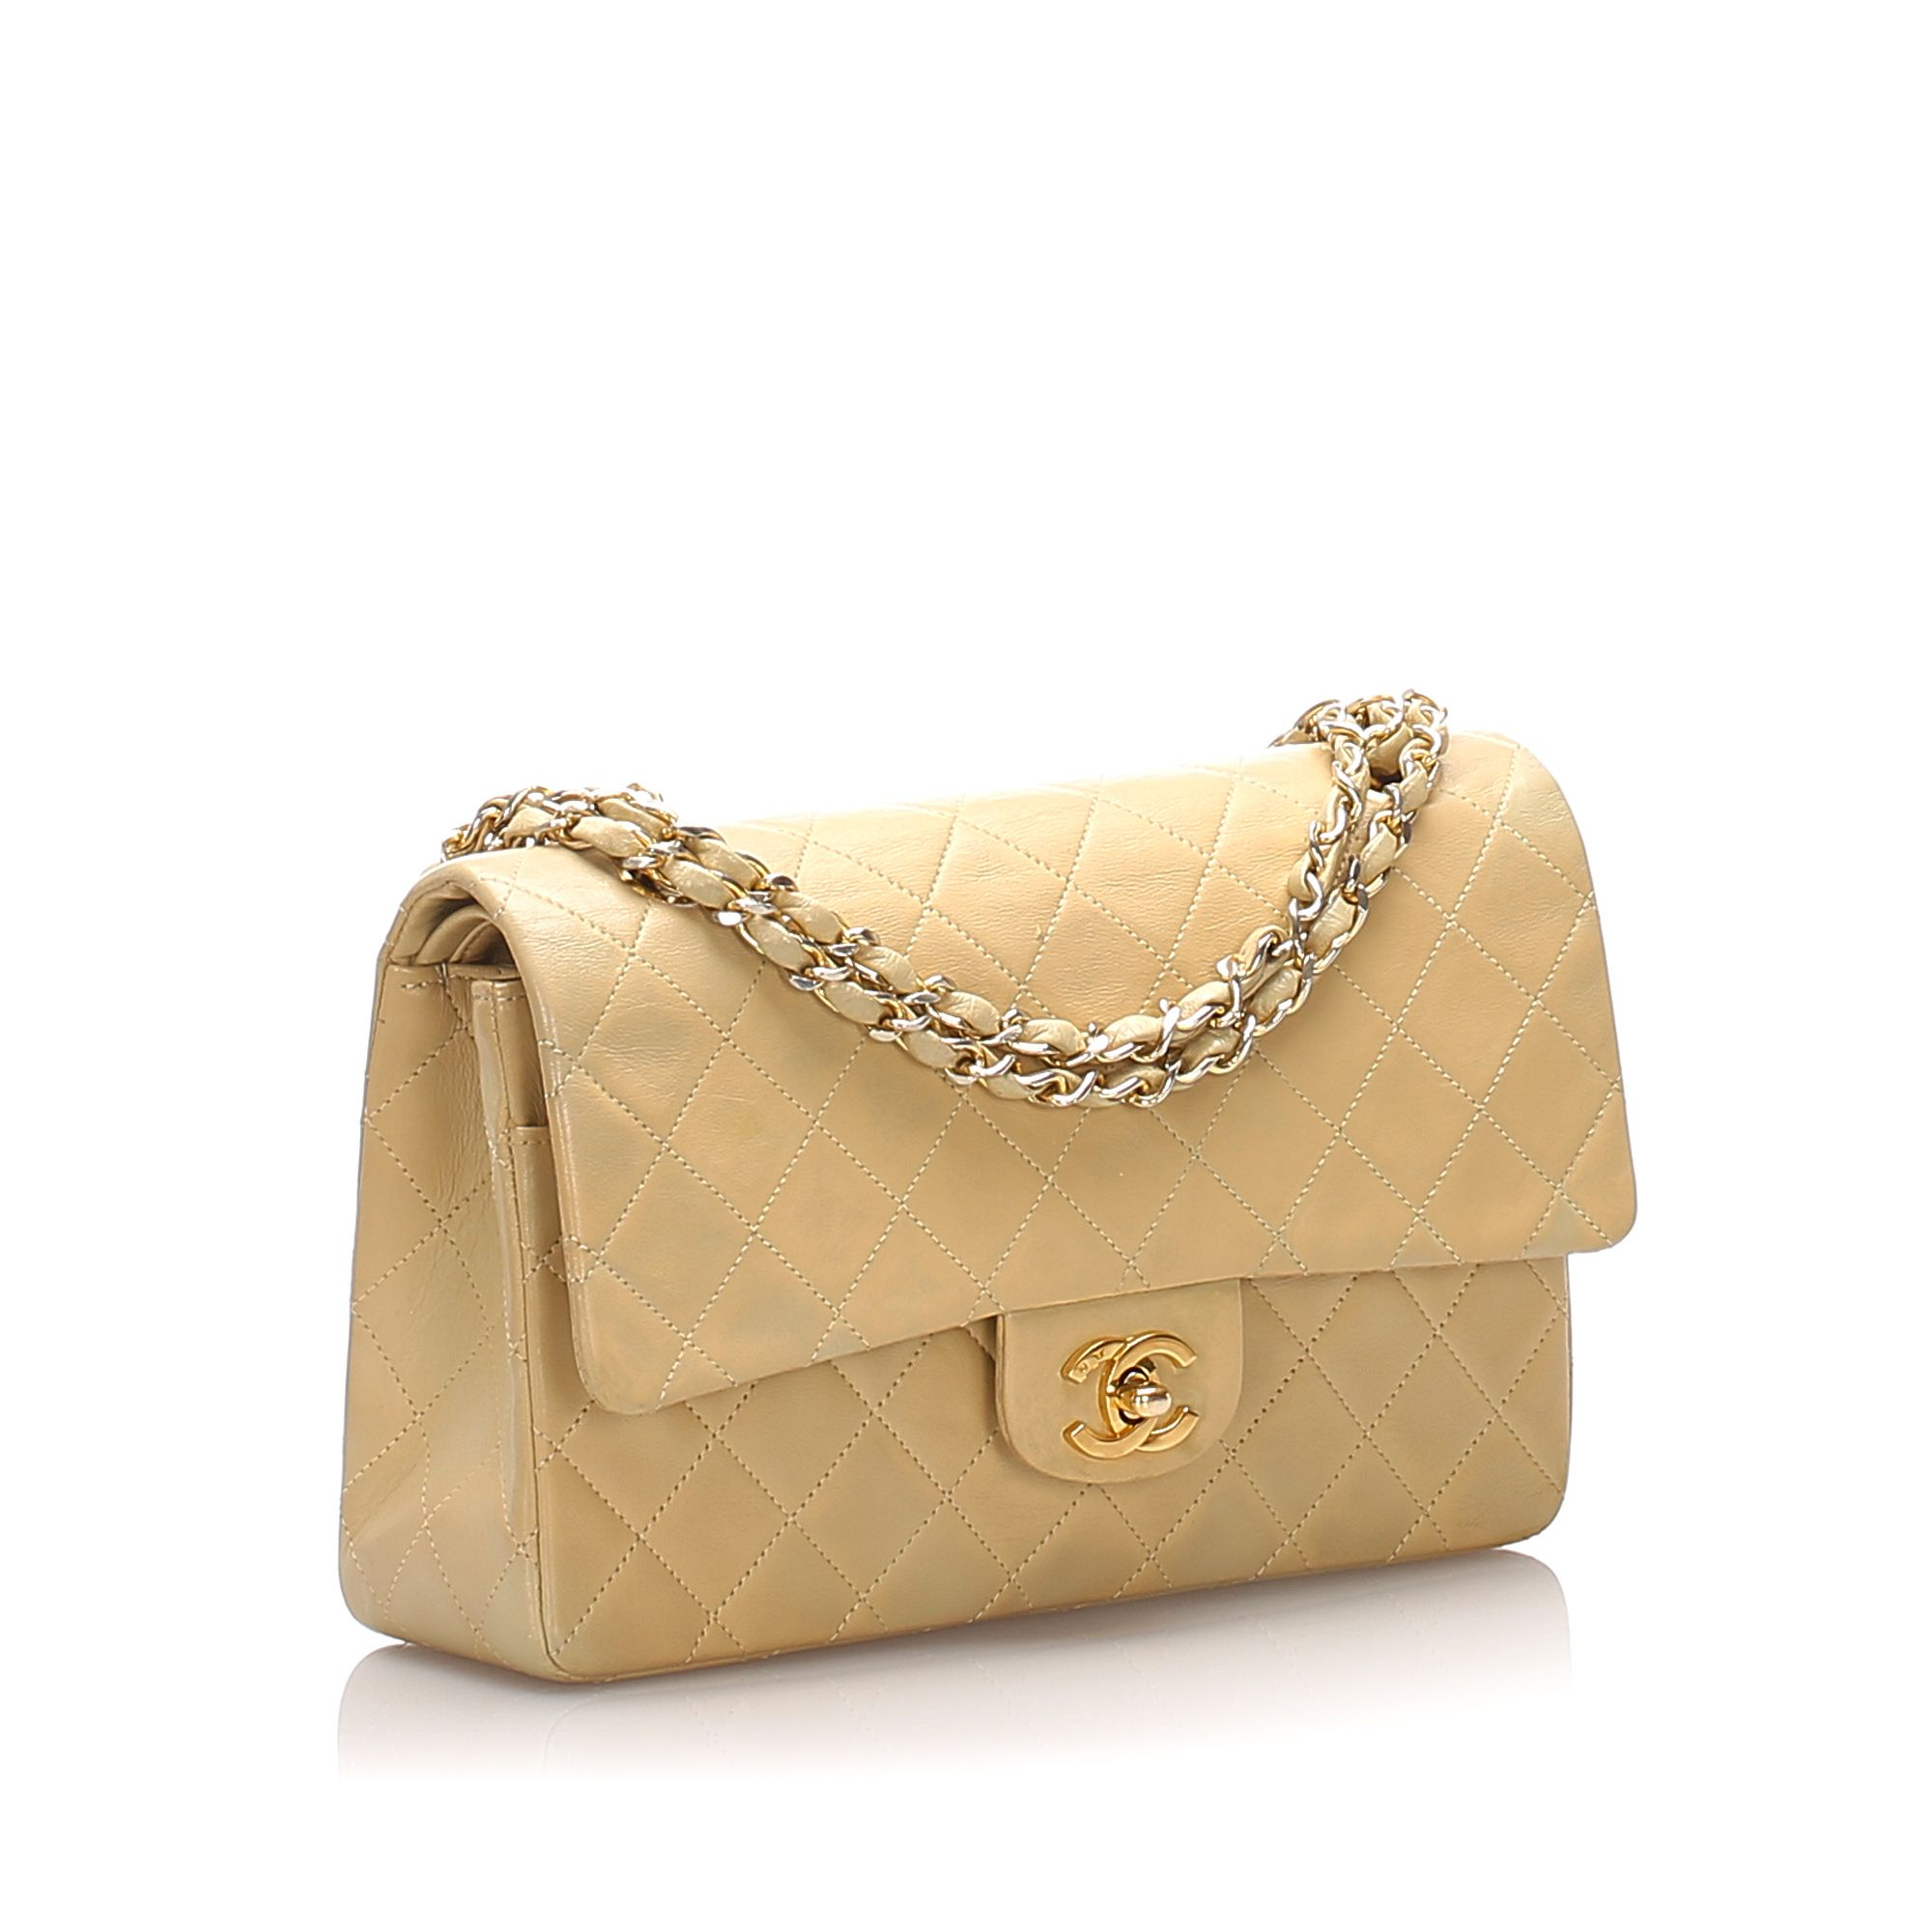 Vintage Chanel Classic Medium Lambskin Double Flap Bag Brown